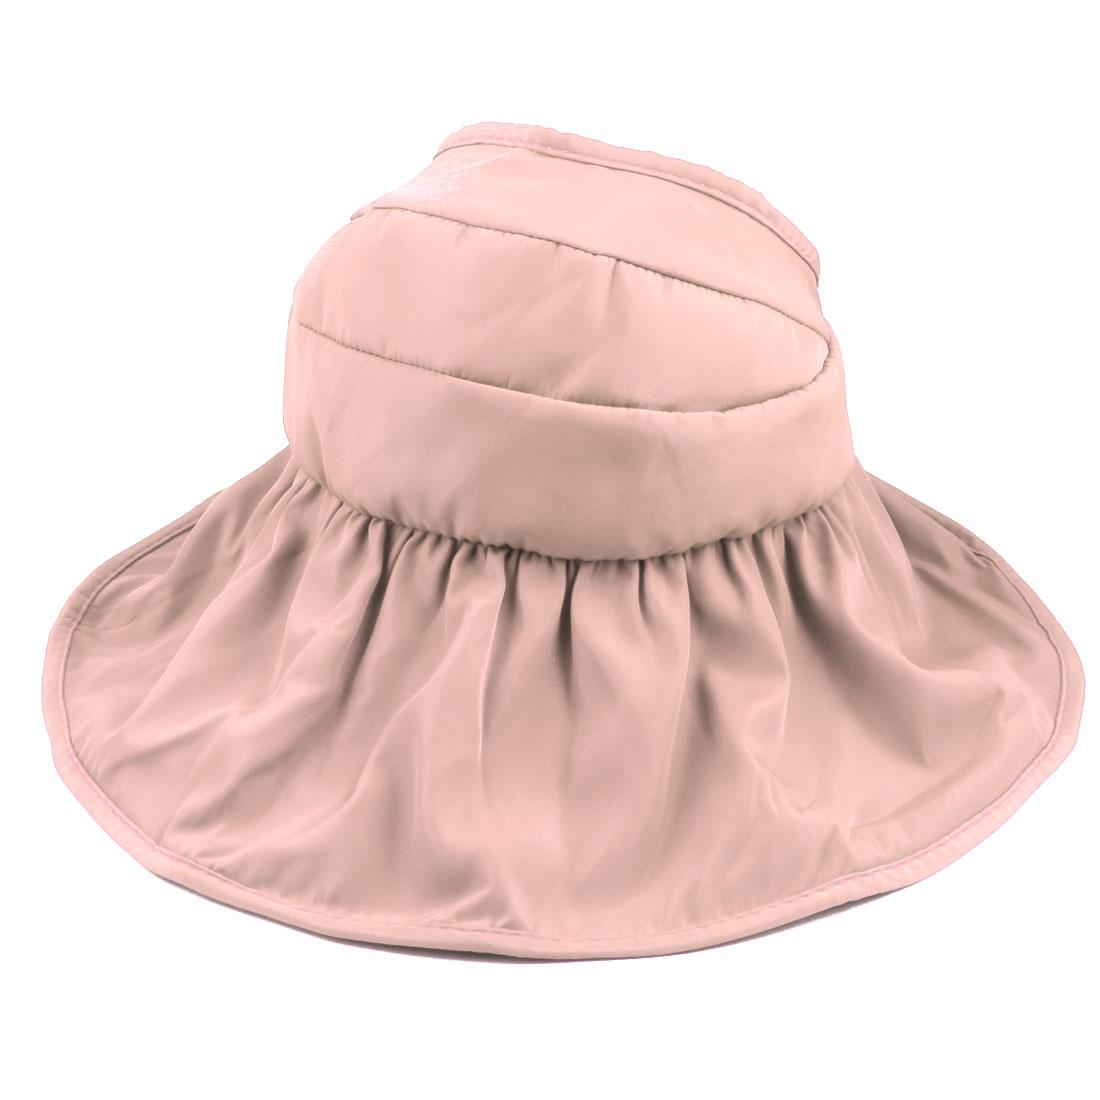 Woman Summer Outdoor Roll Up Wide Floppy Brim Foldable Visor Cap Sun Protector Hat Light Pink